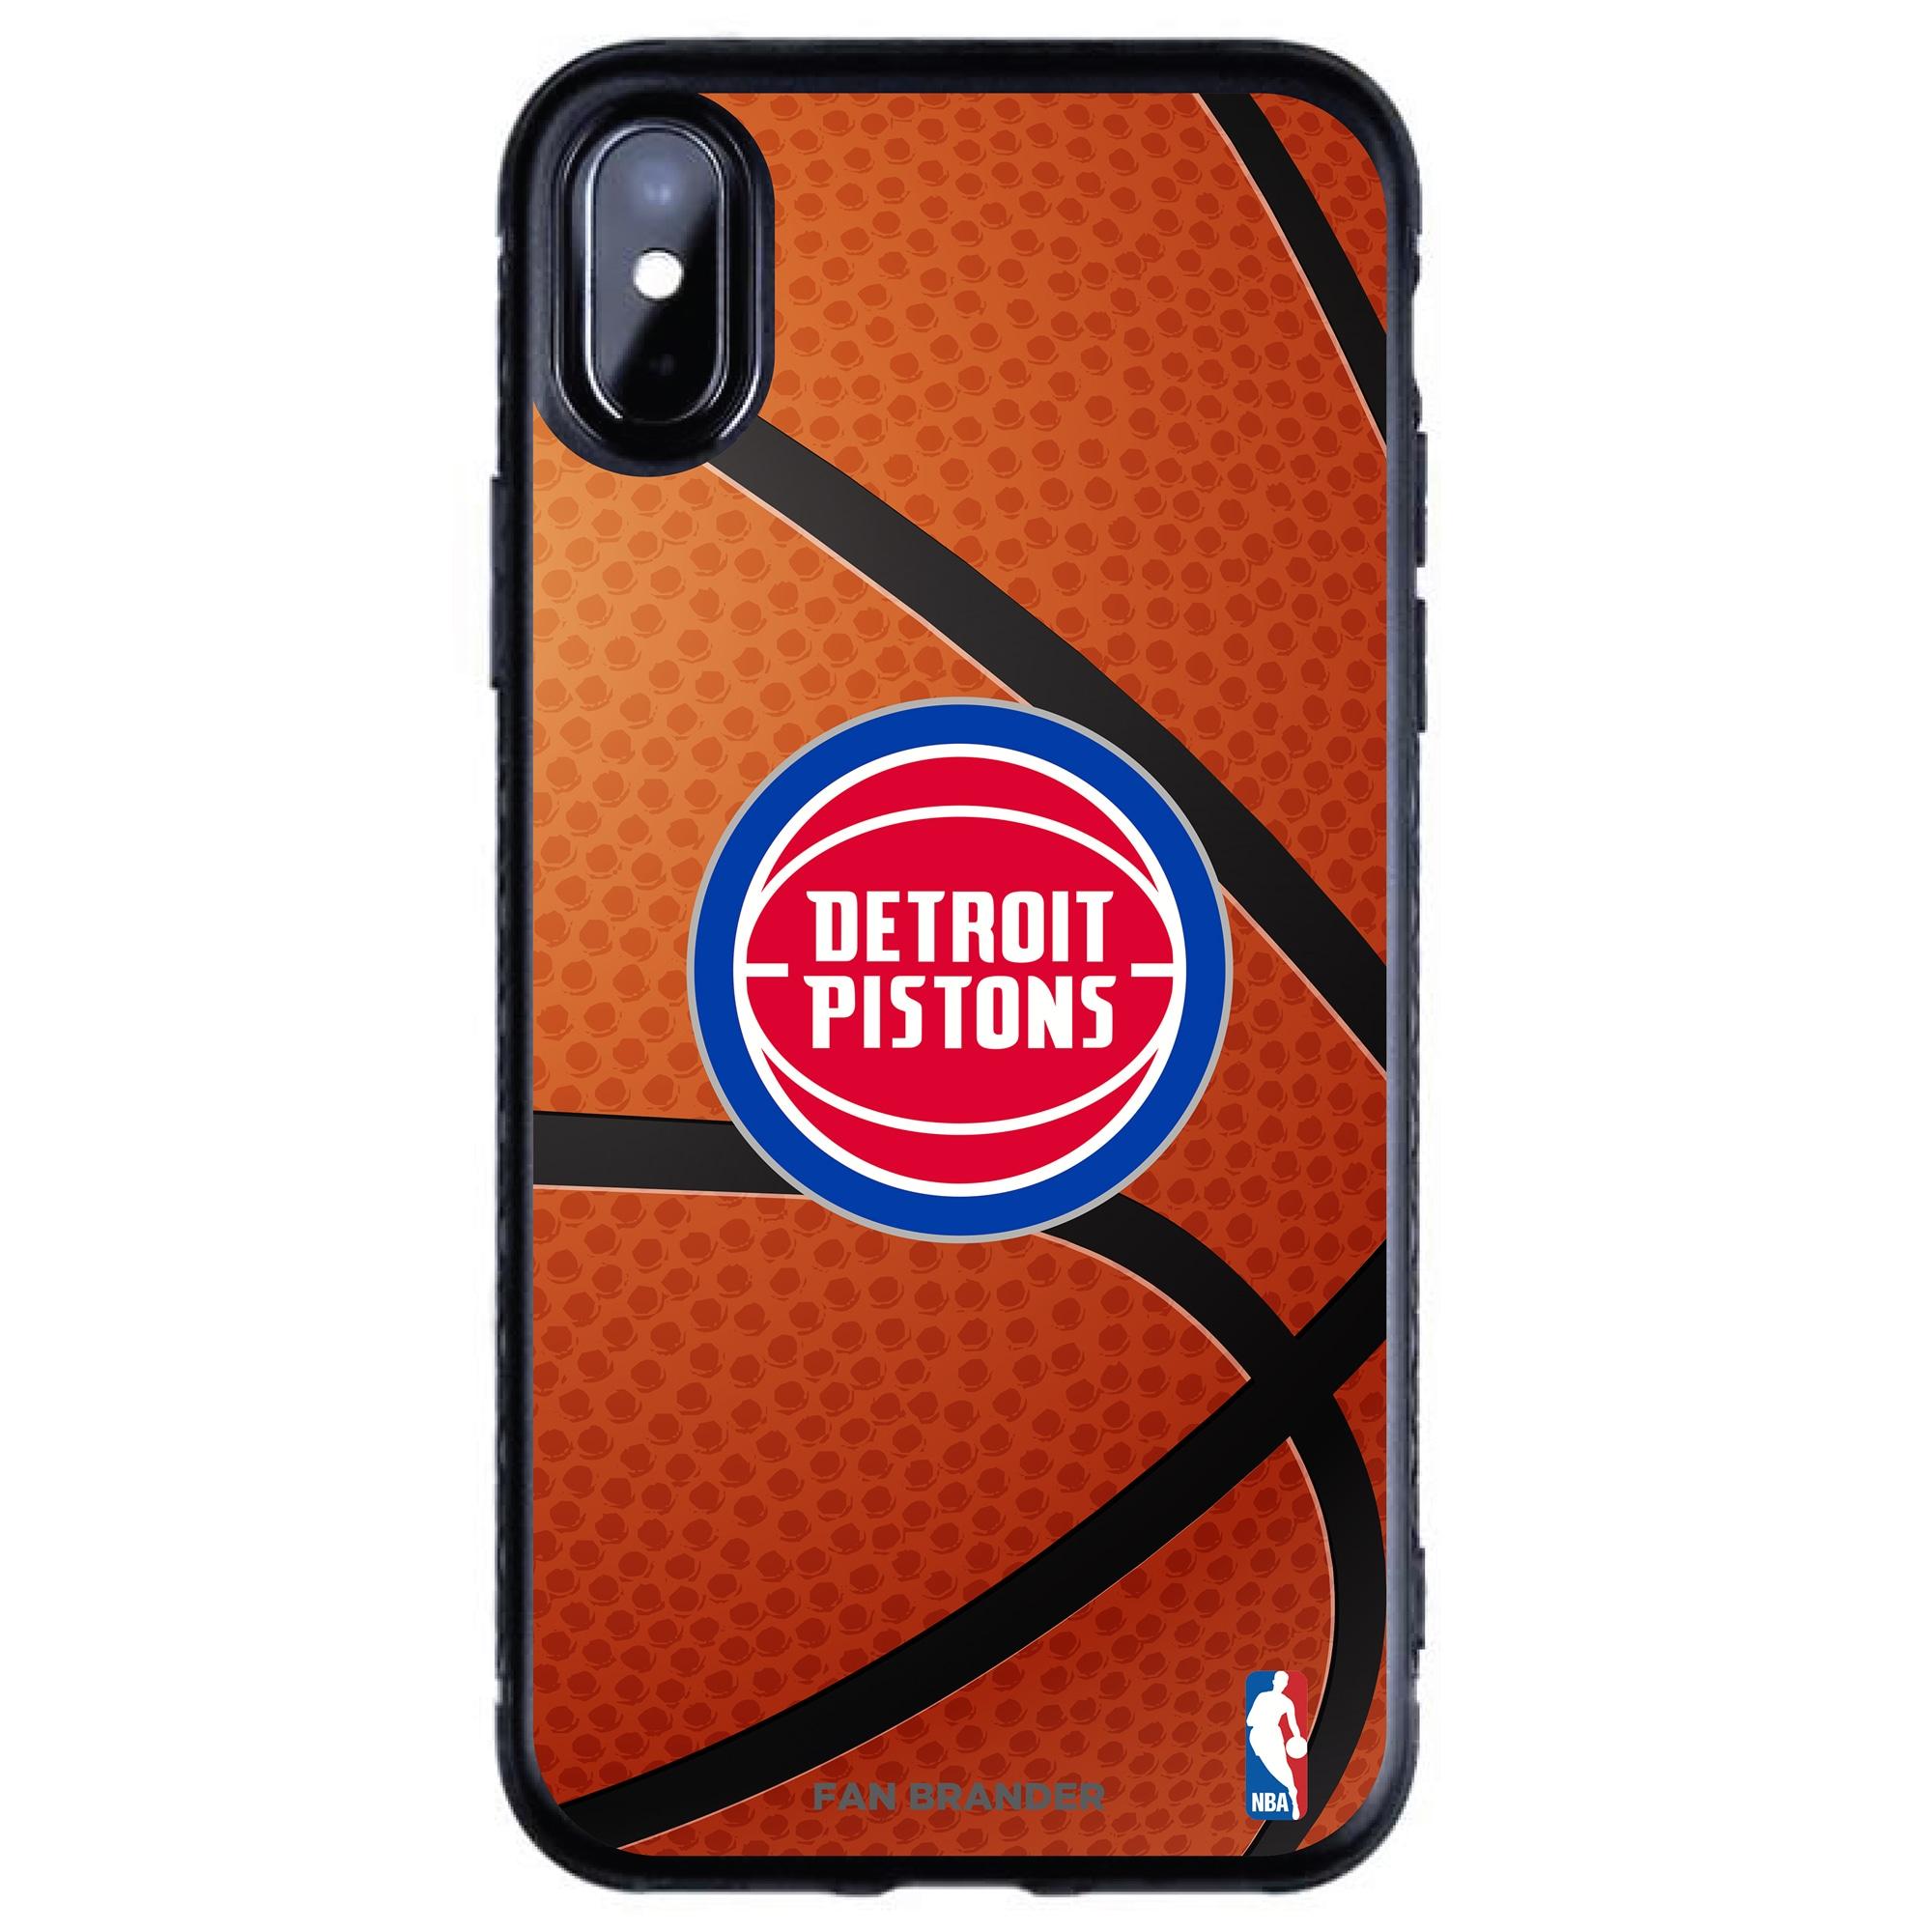 Detroit Pistons Primary Mark iPhone Case